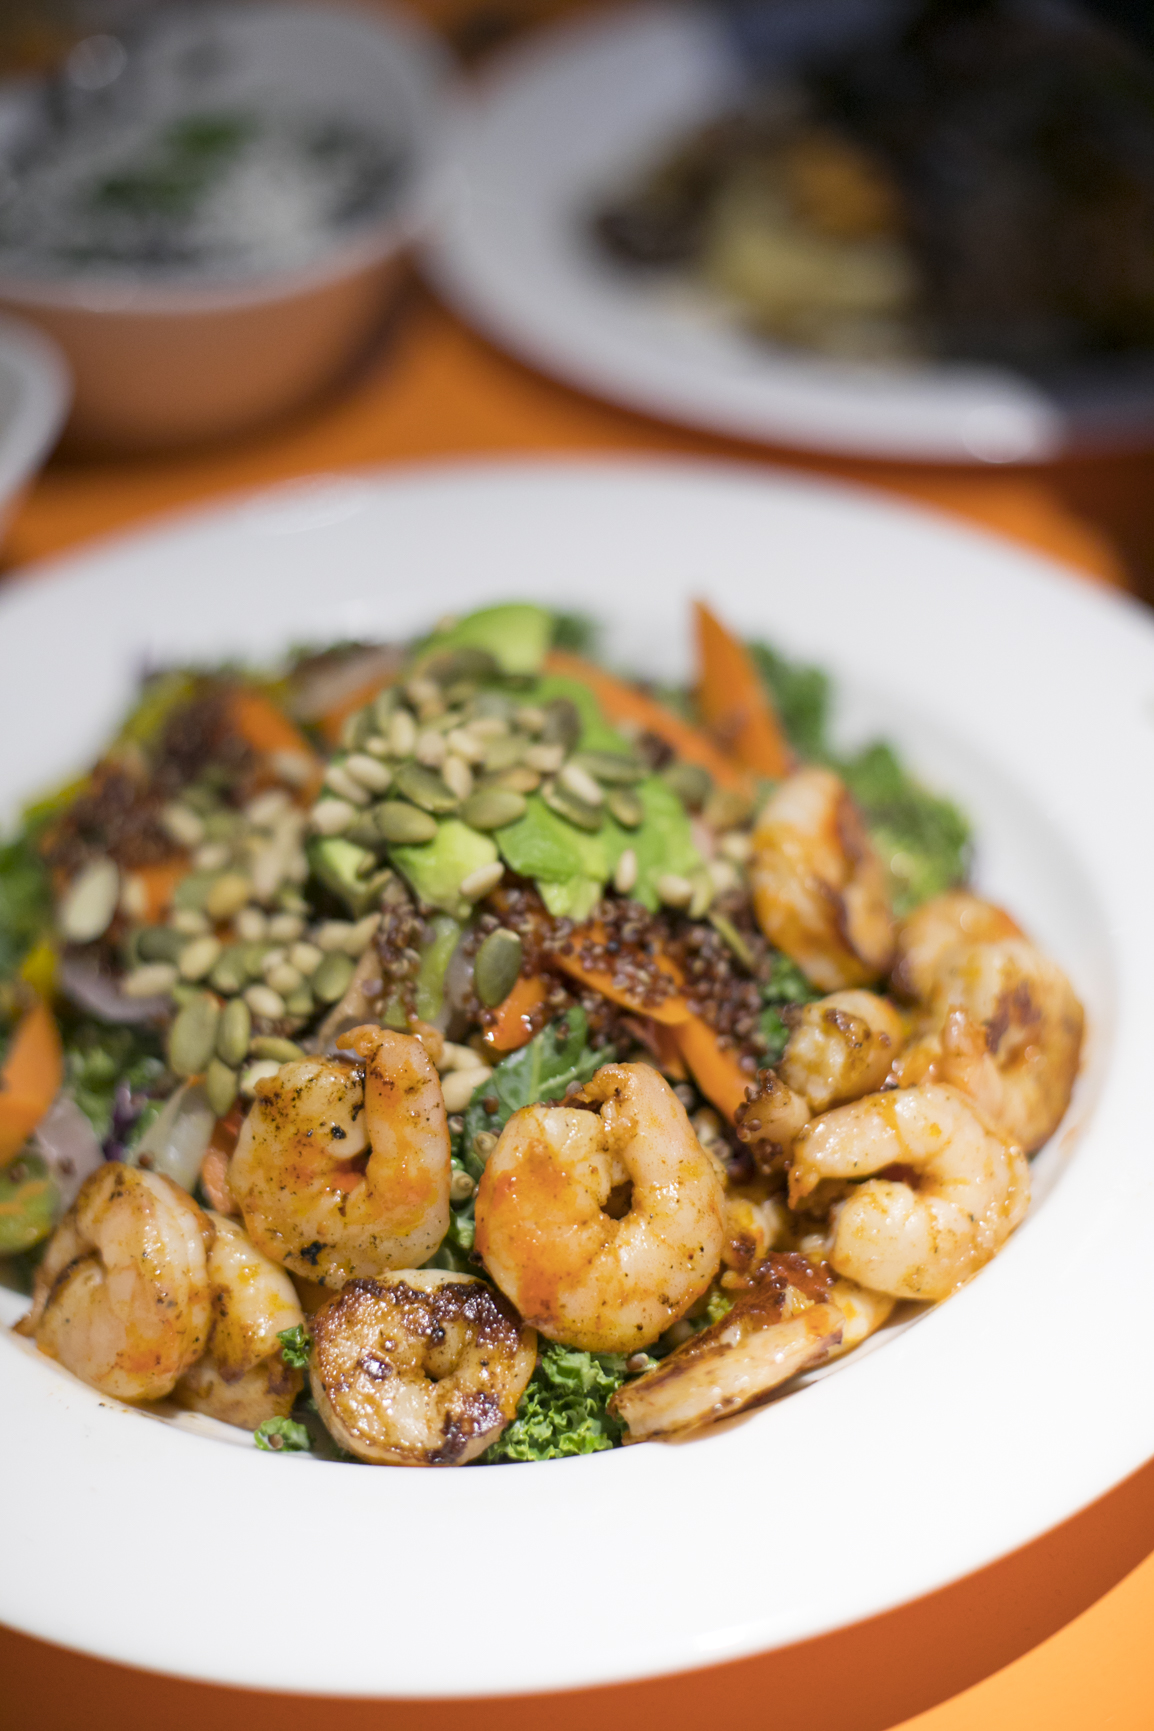 Shrimp Salad with Kale from 89Agave Sedona Arizona